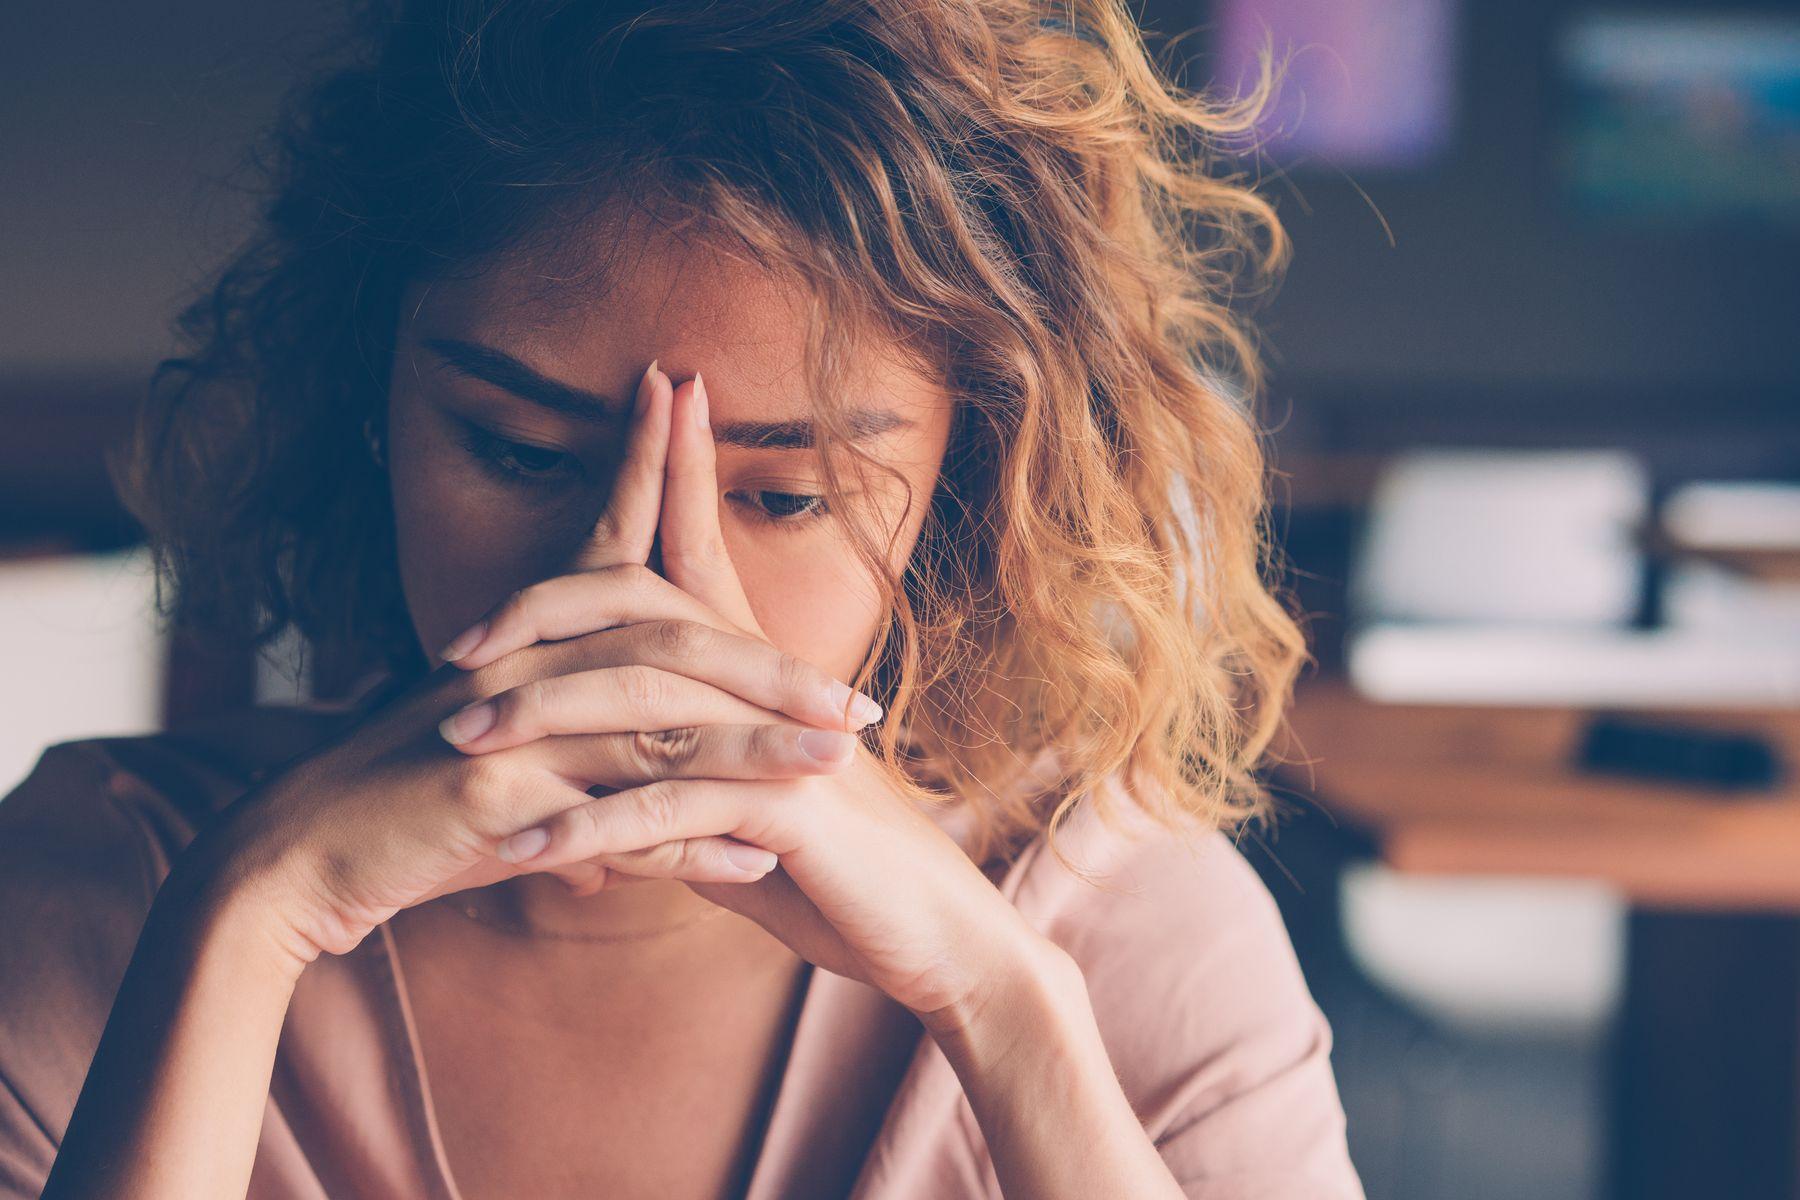 Bankruptcy Case Study: Single Adult Female